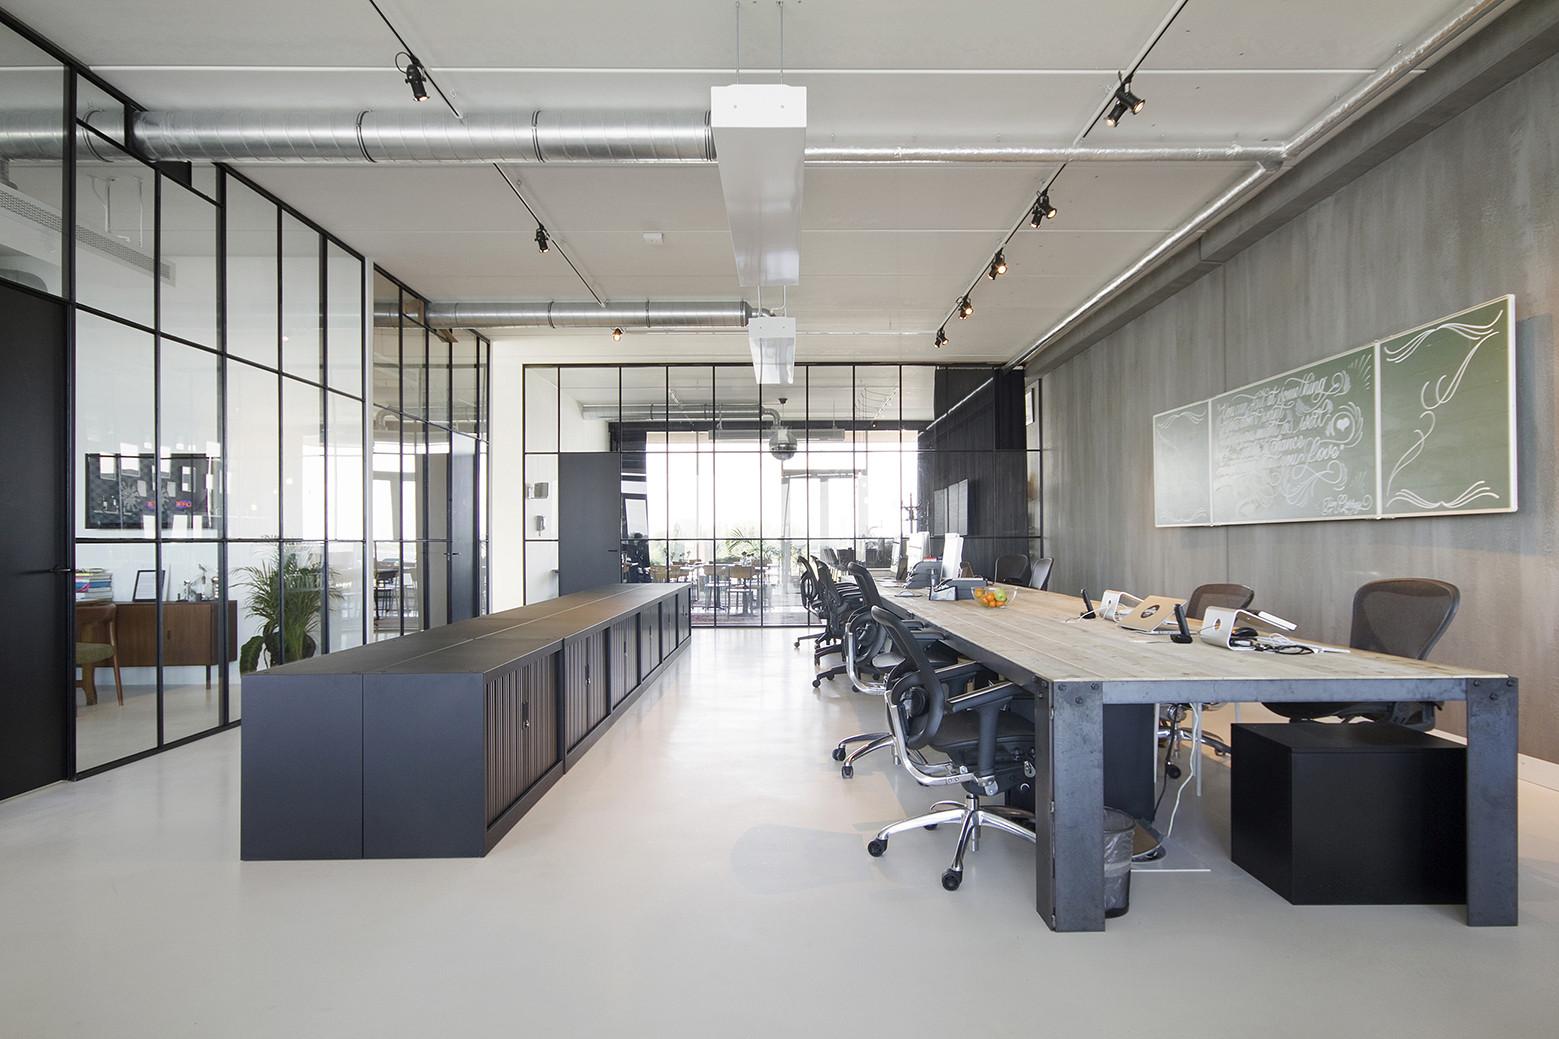 Brandbase dedato archdaily for Kantoor interieur ideeen